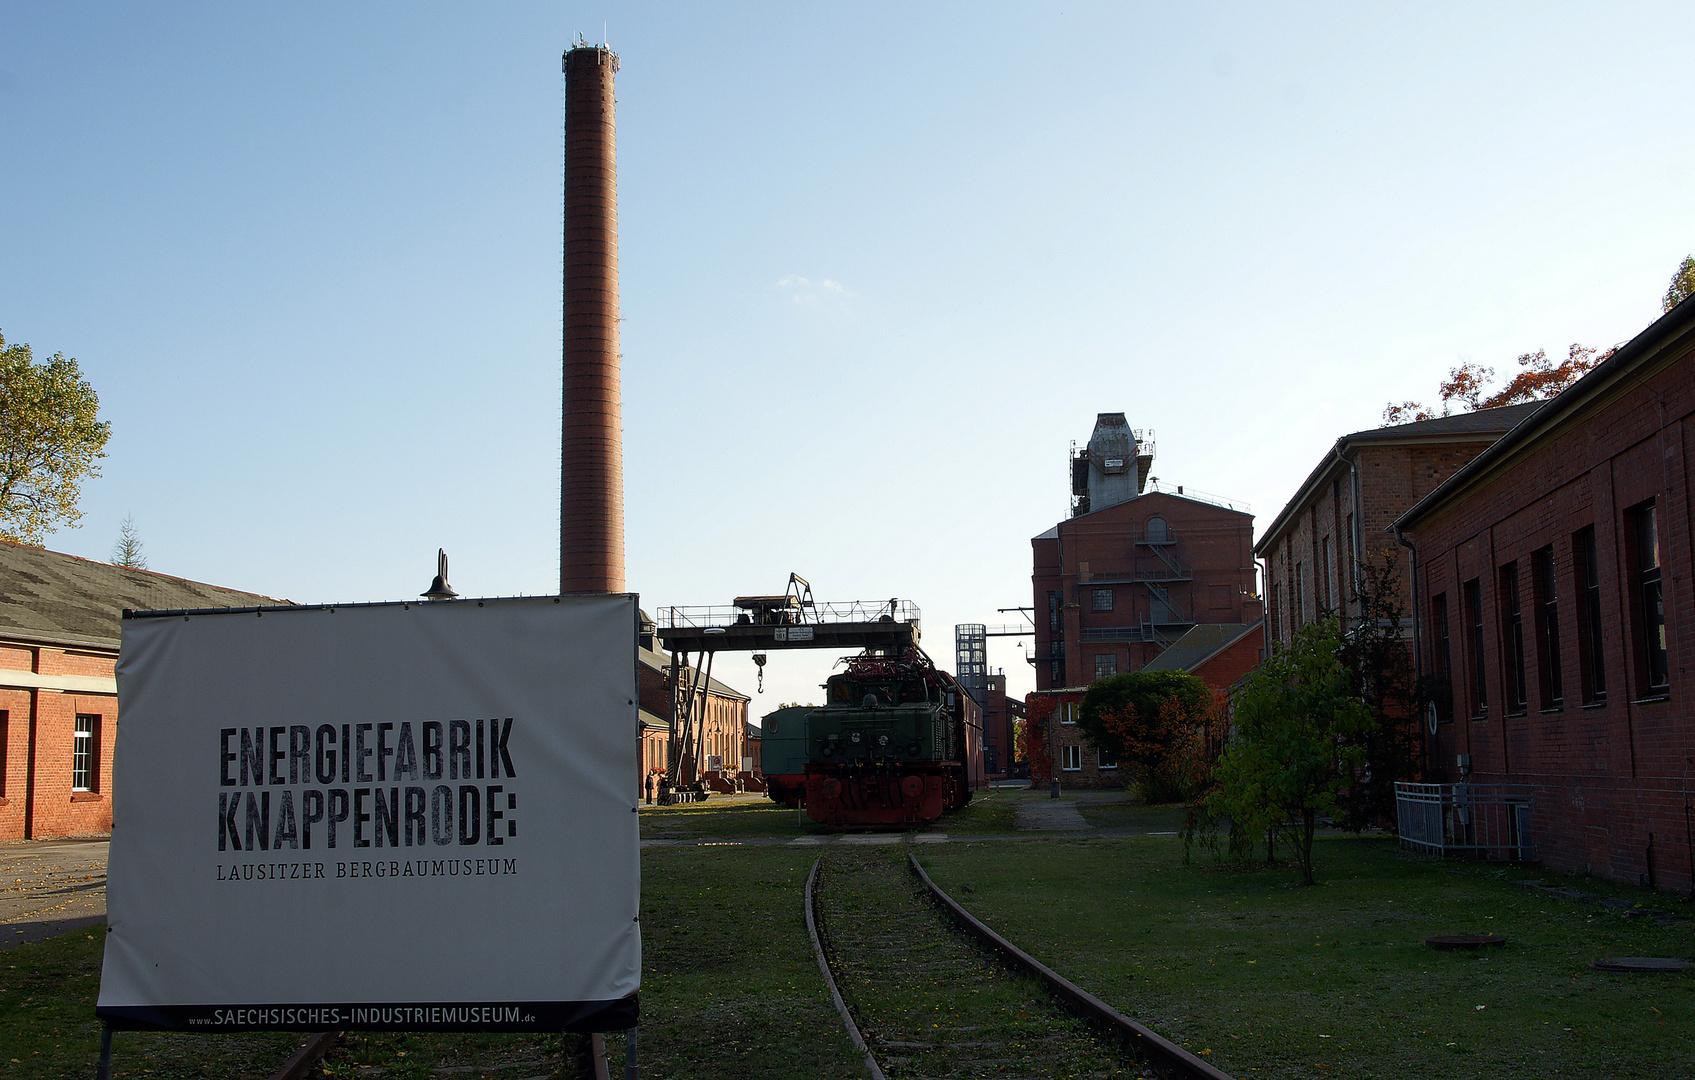 ..... ehemalige Brikettfabrik / Knappenrode